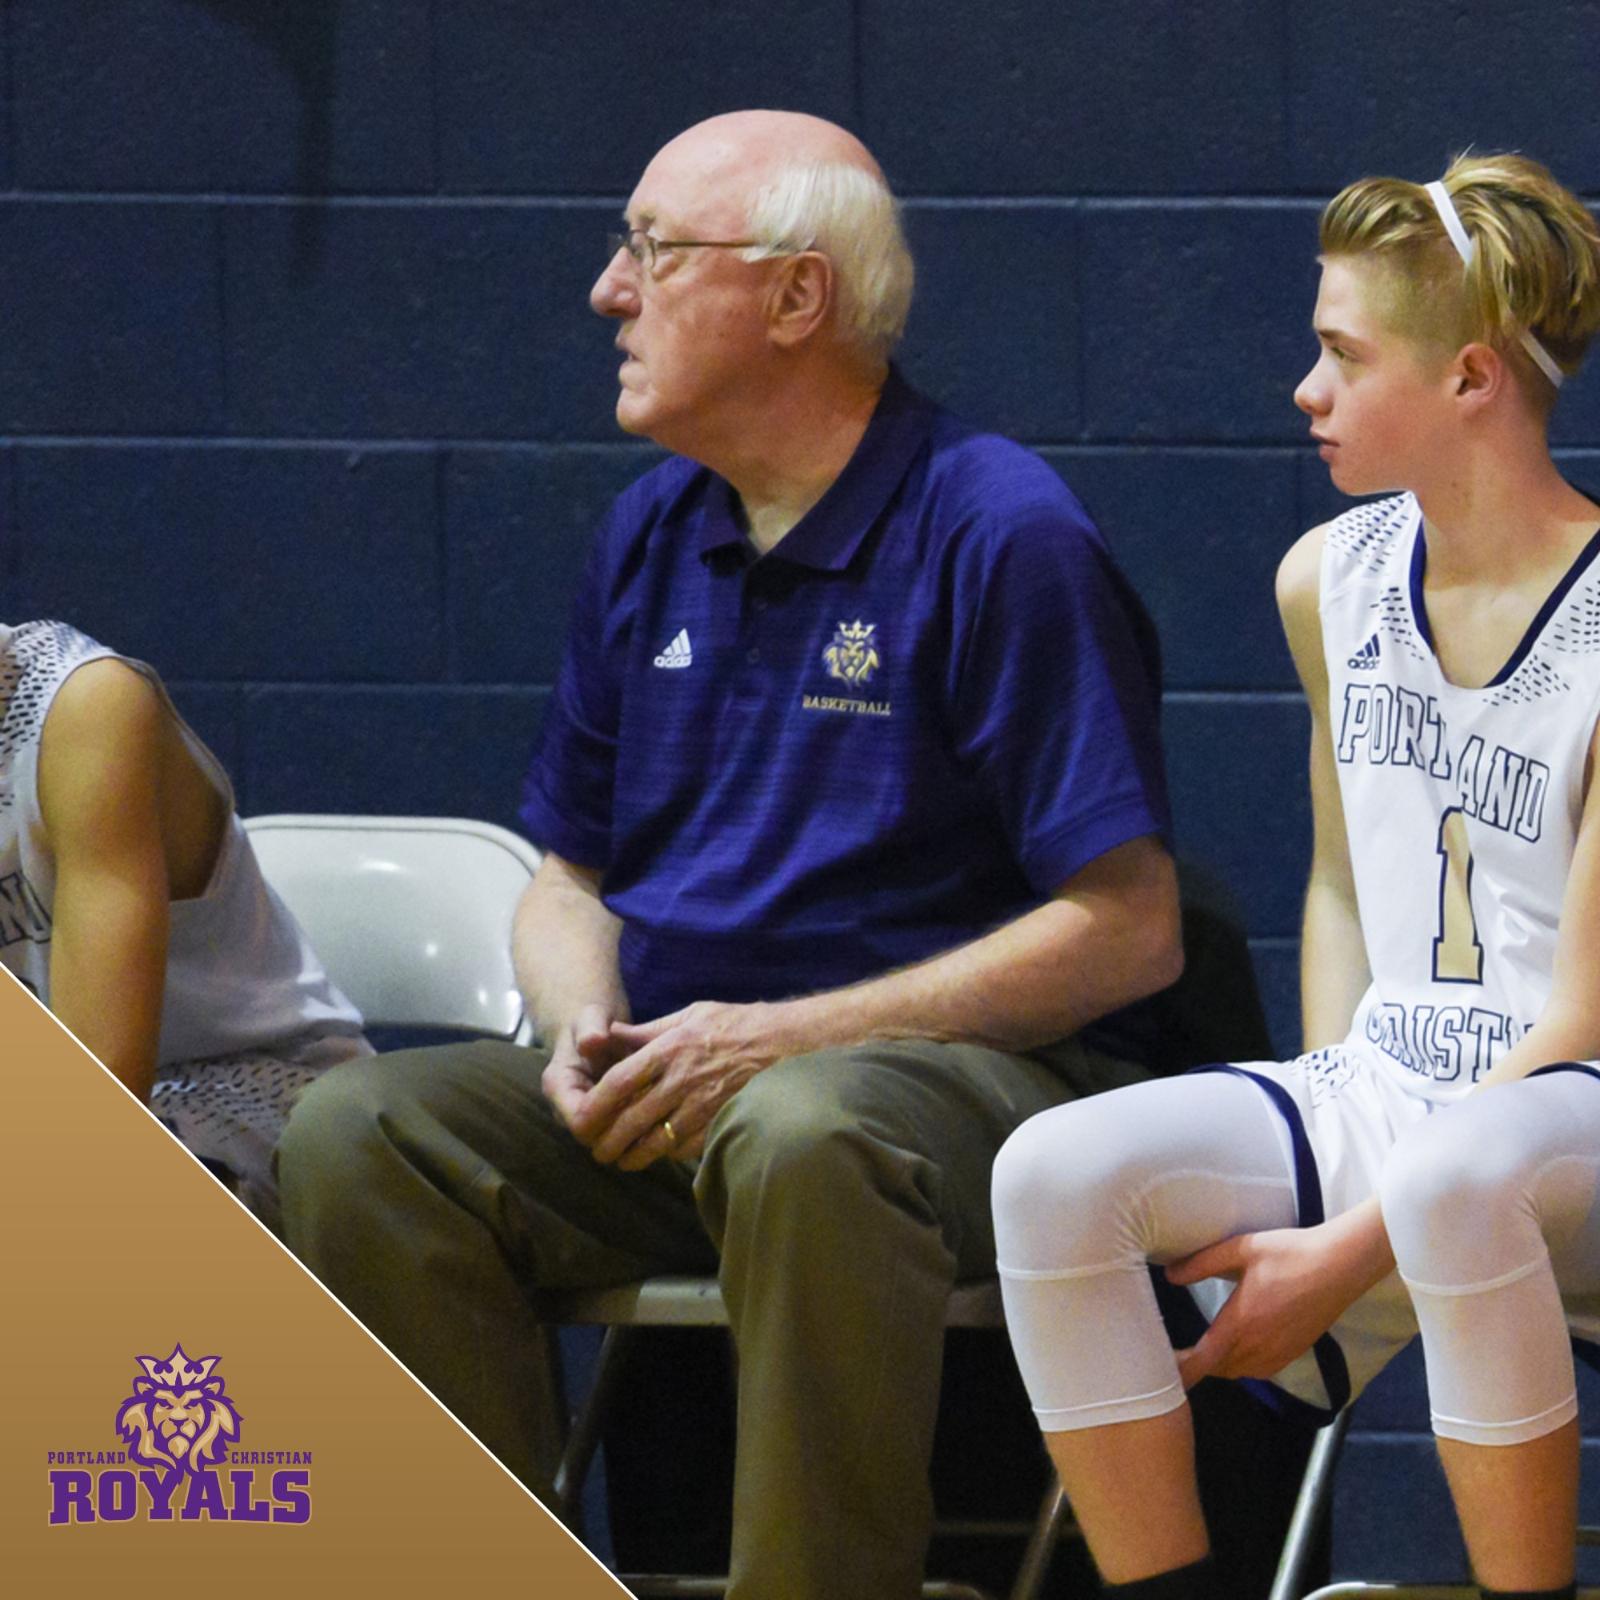 Coaching Spotlight: Rich Remsburg